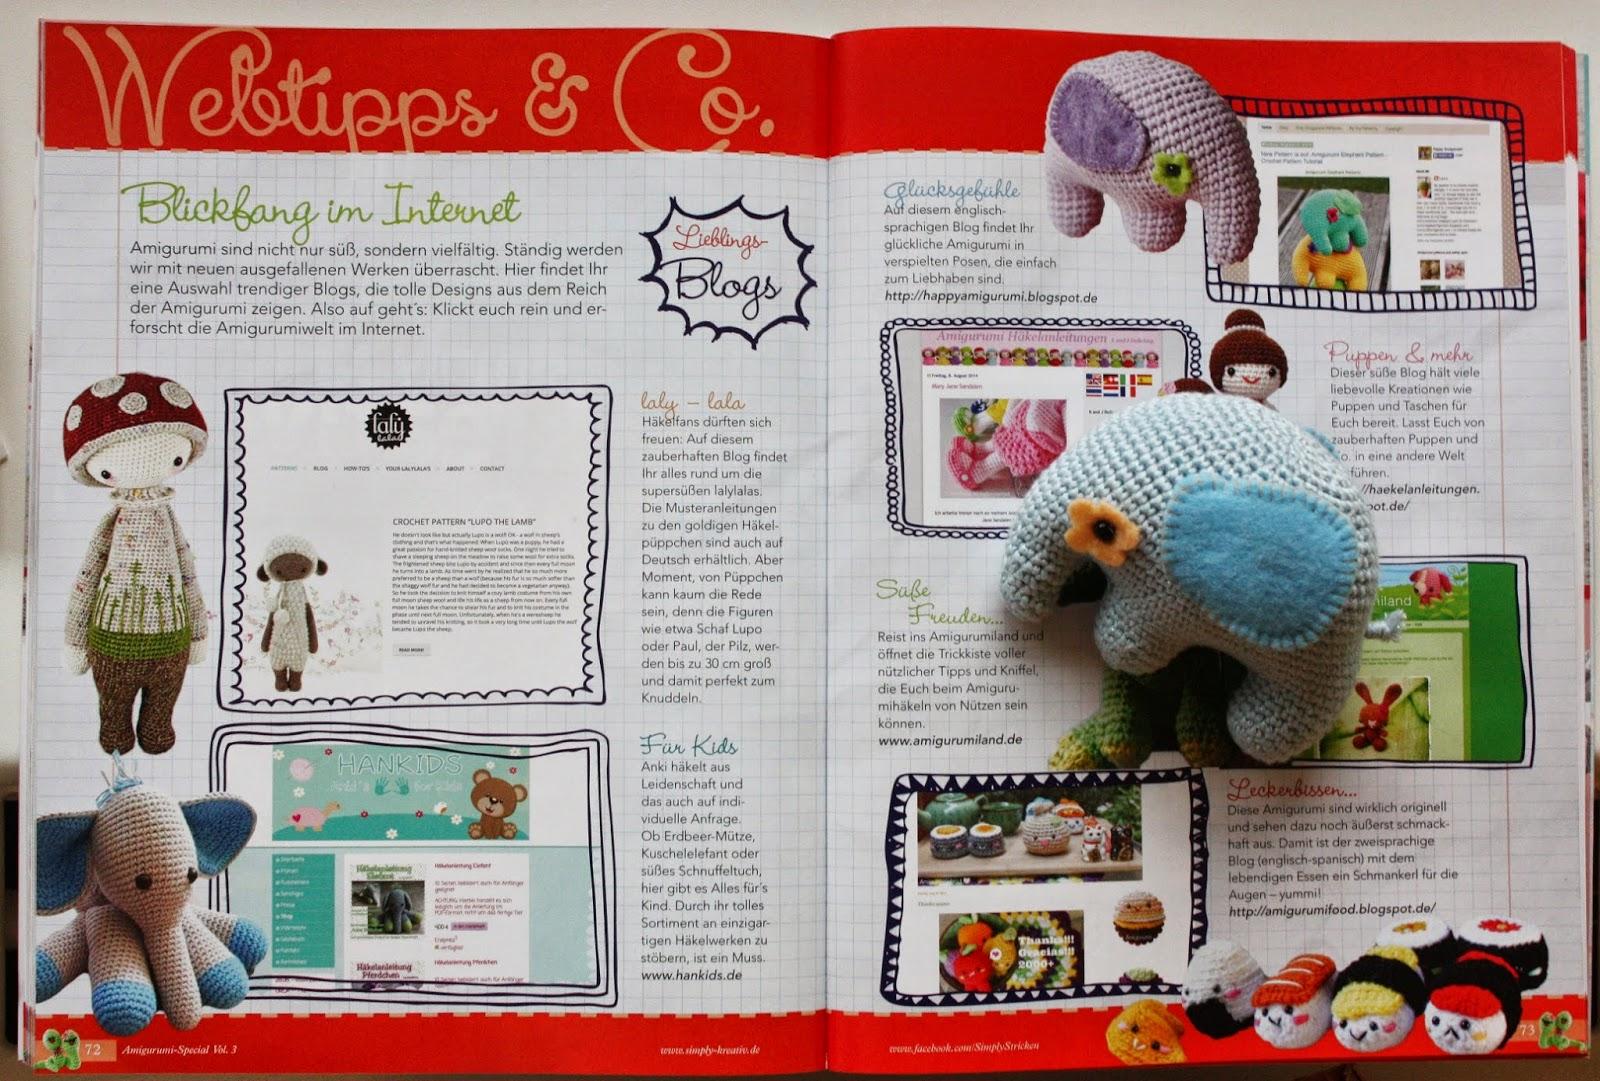 Amigurumi Magazine Subscription : Happyamigurumi: My Amigurumi blog in magazine